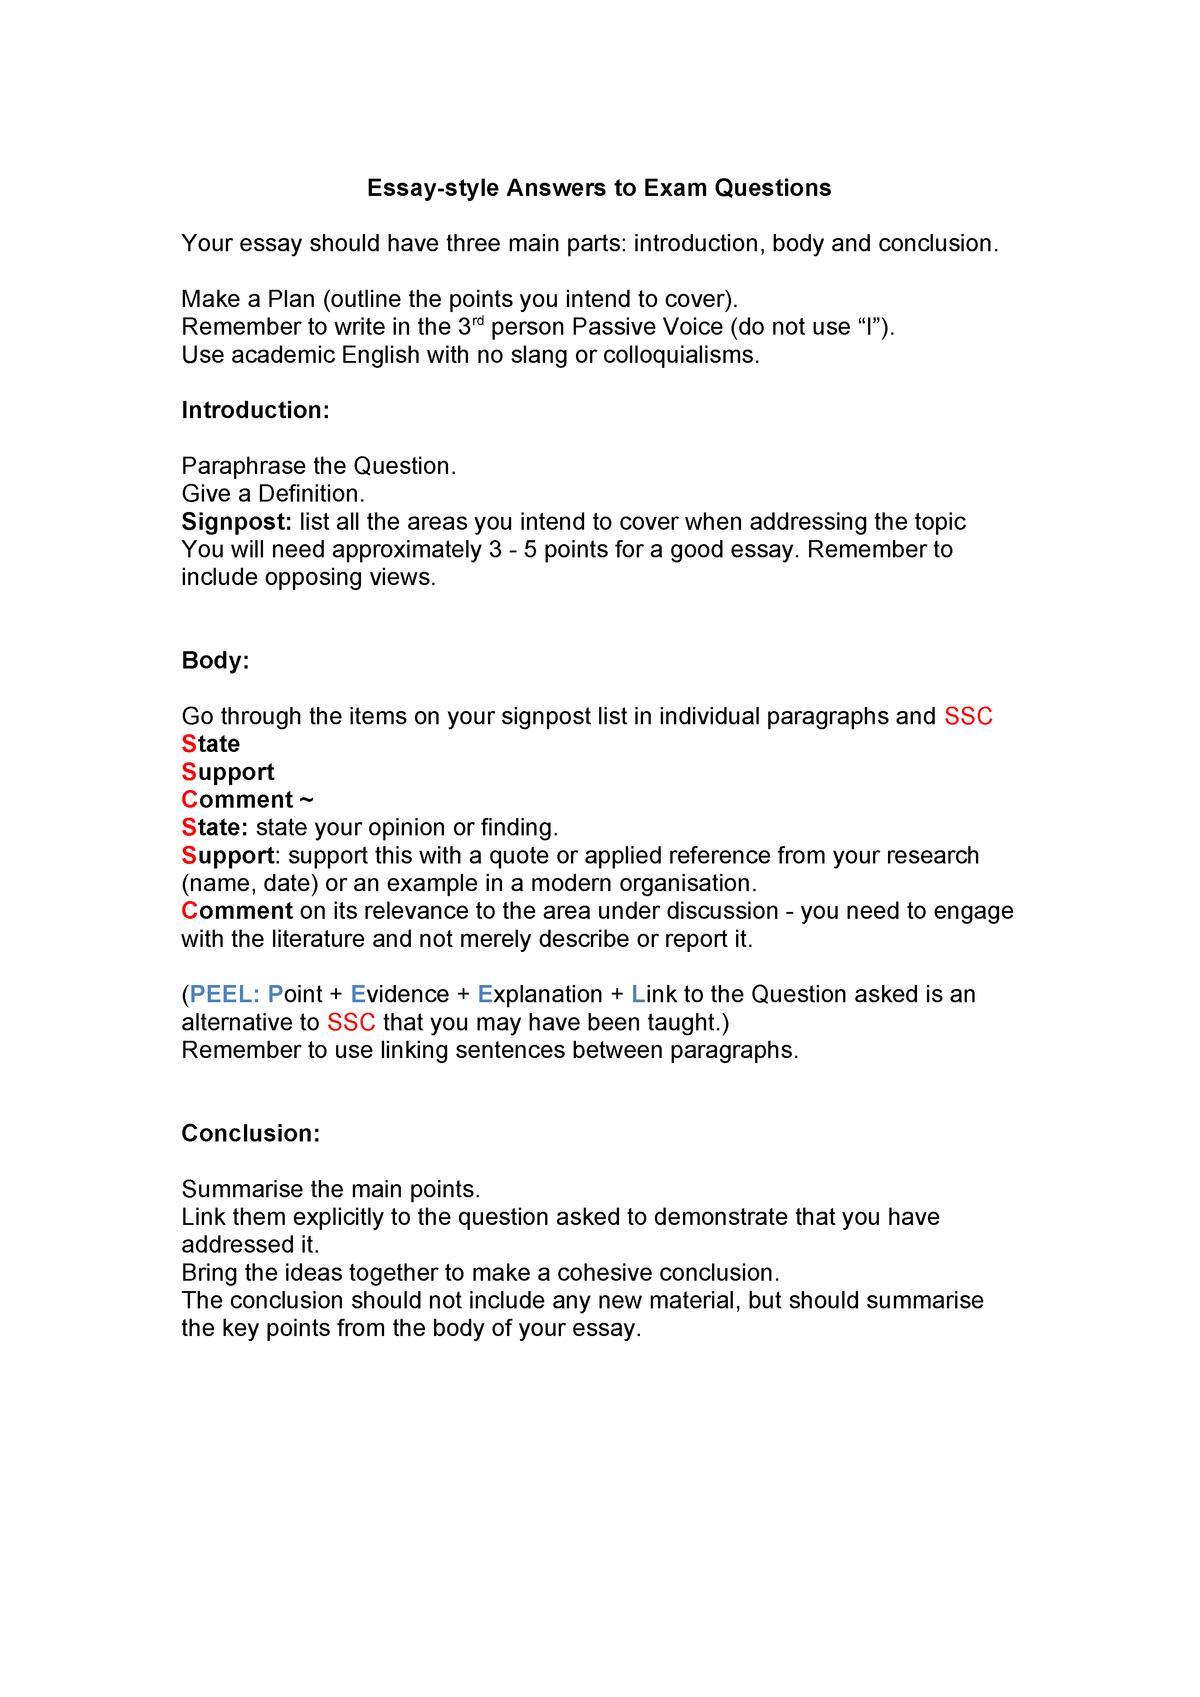 Essay writing template - BBUS502: Making Management